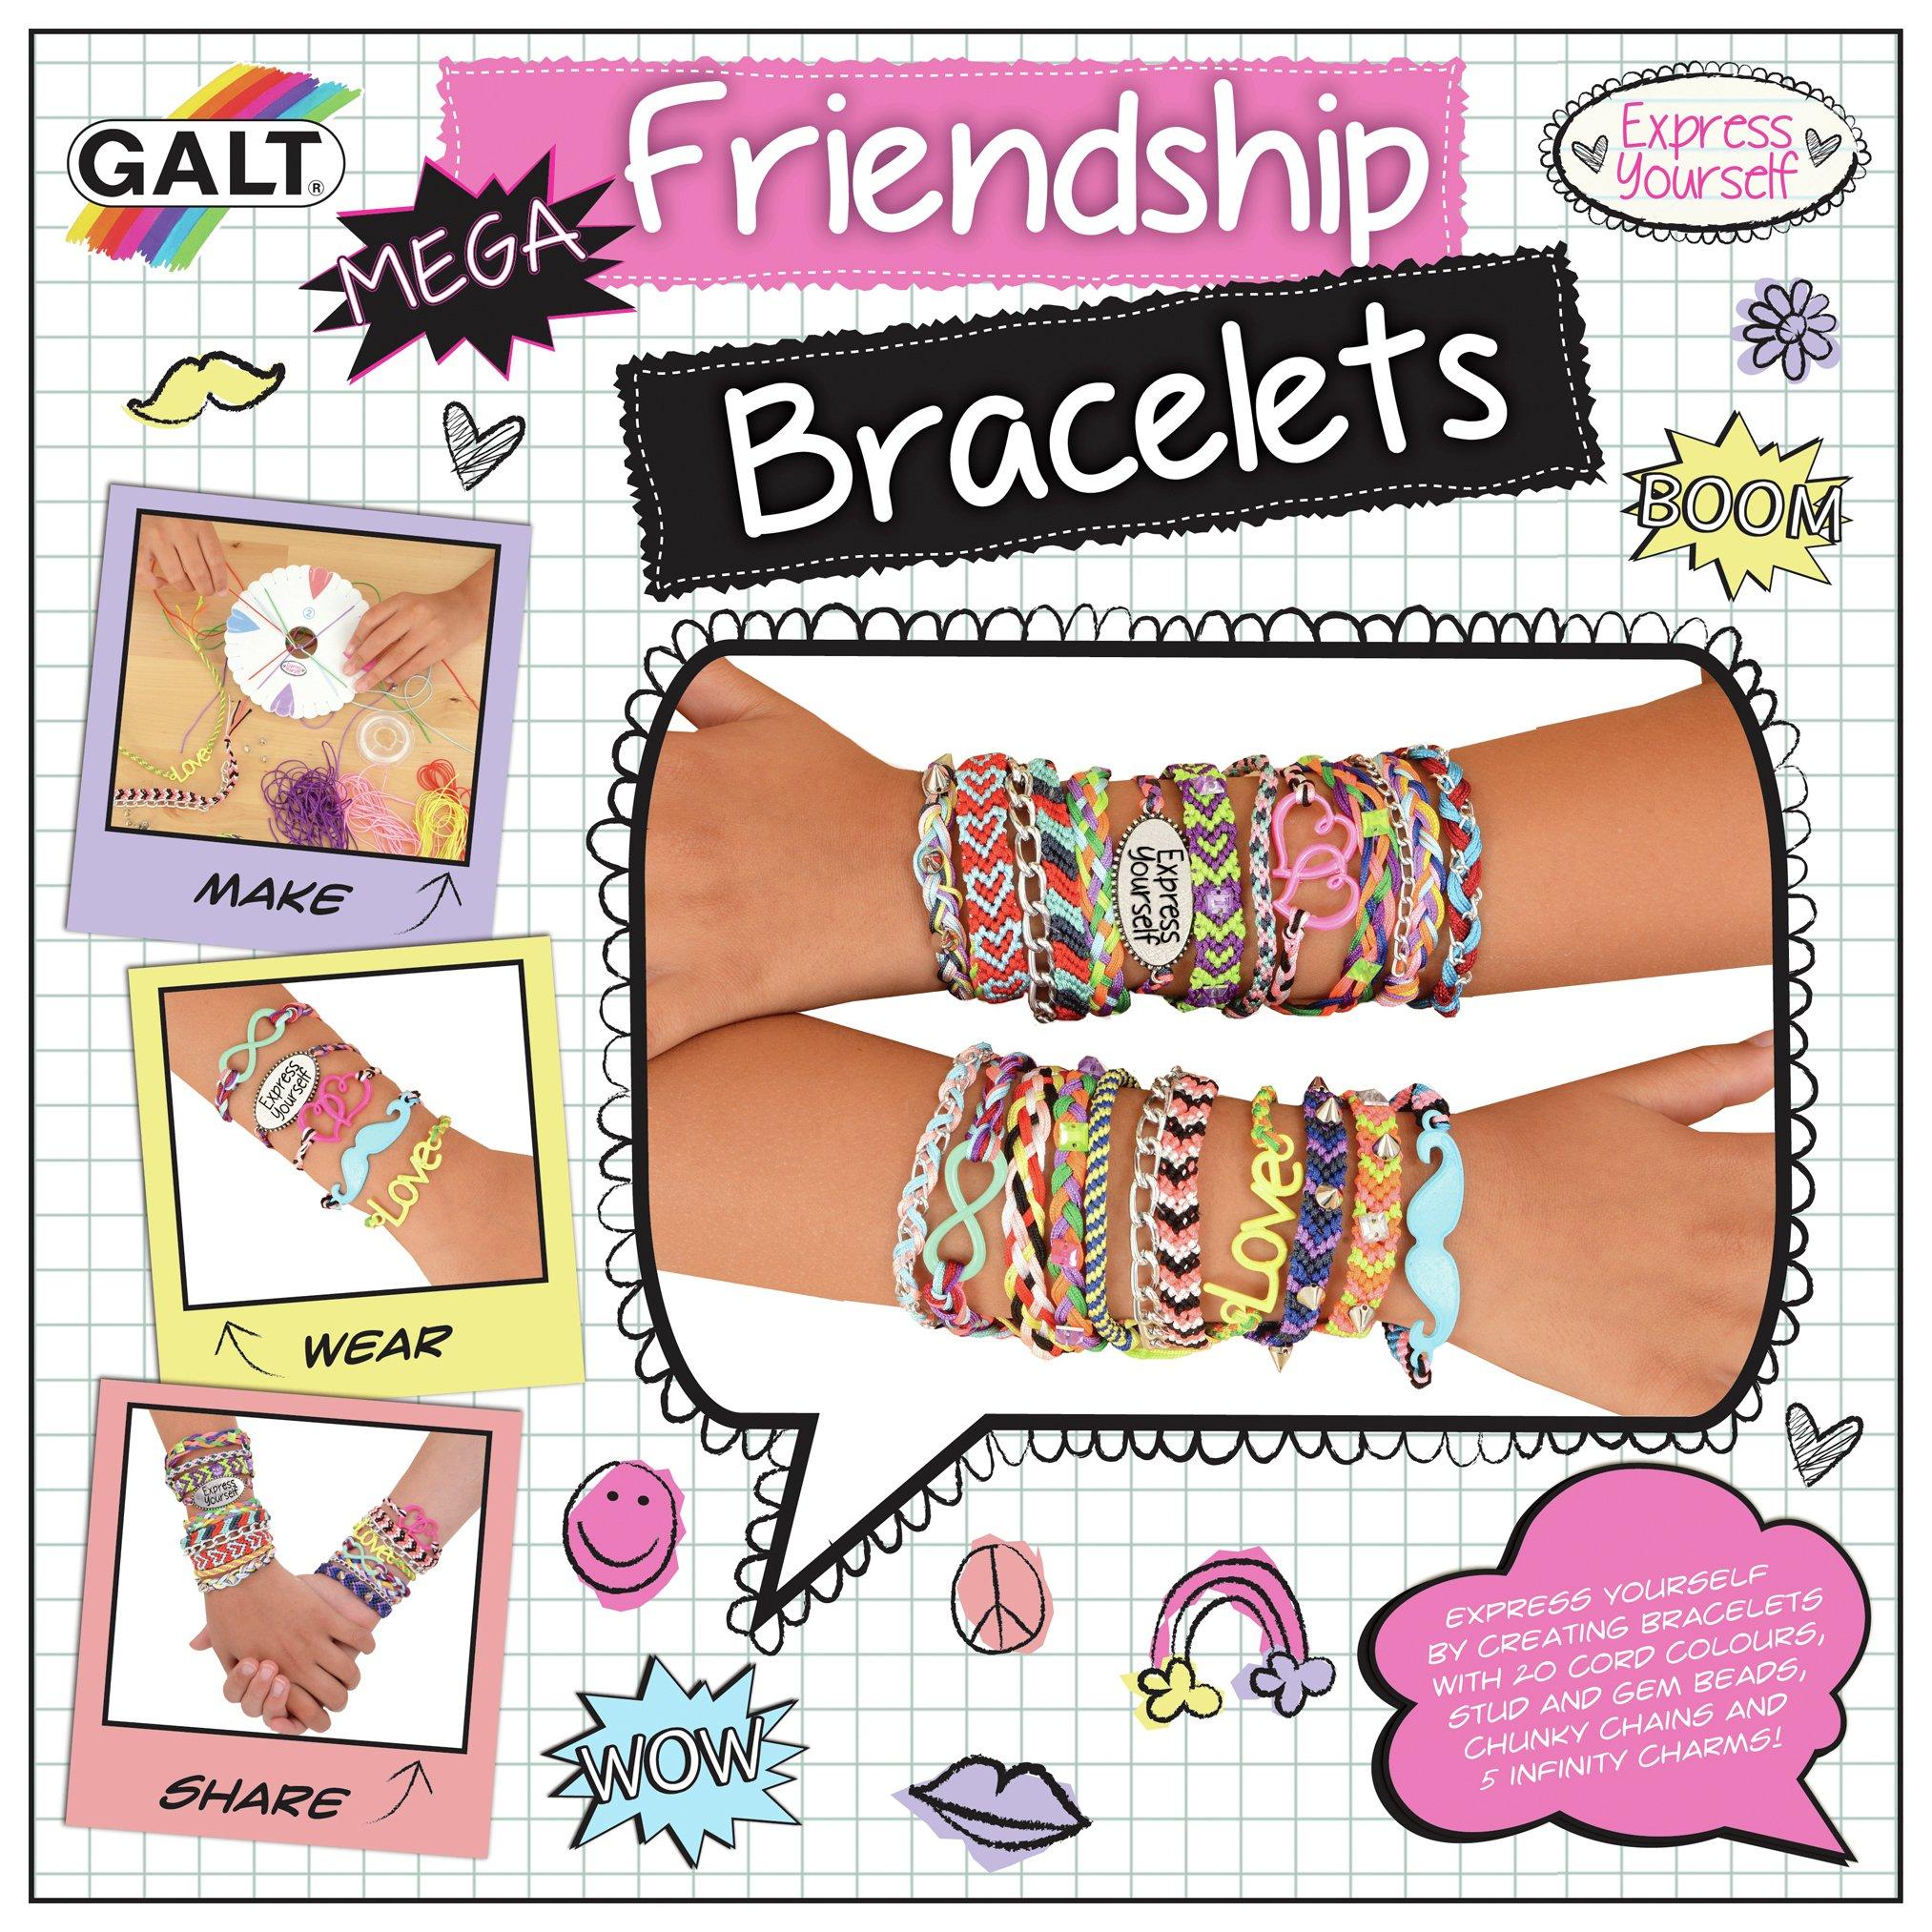 express-yourself-mega-friendship-bracelets